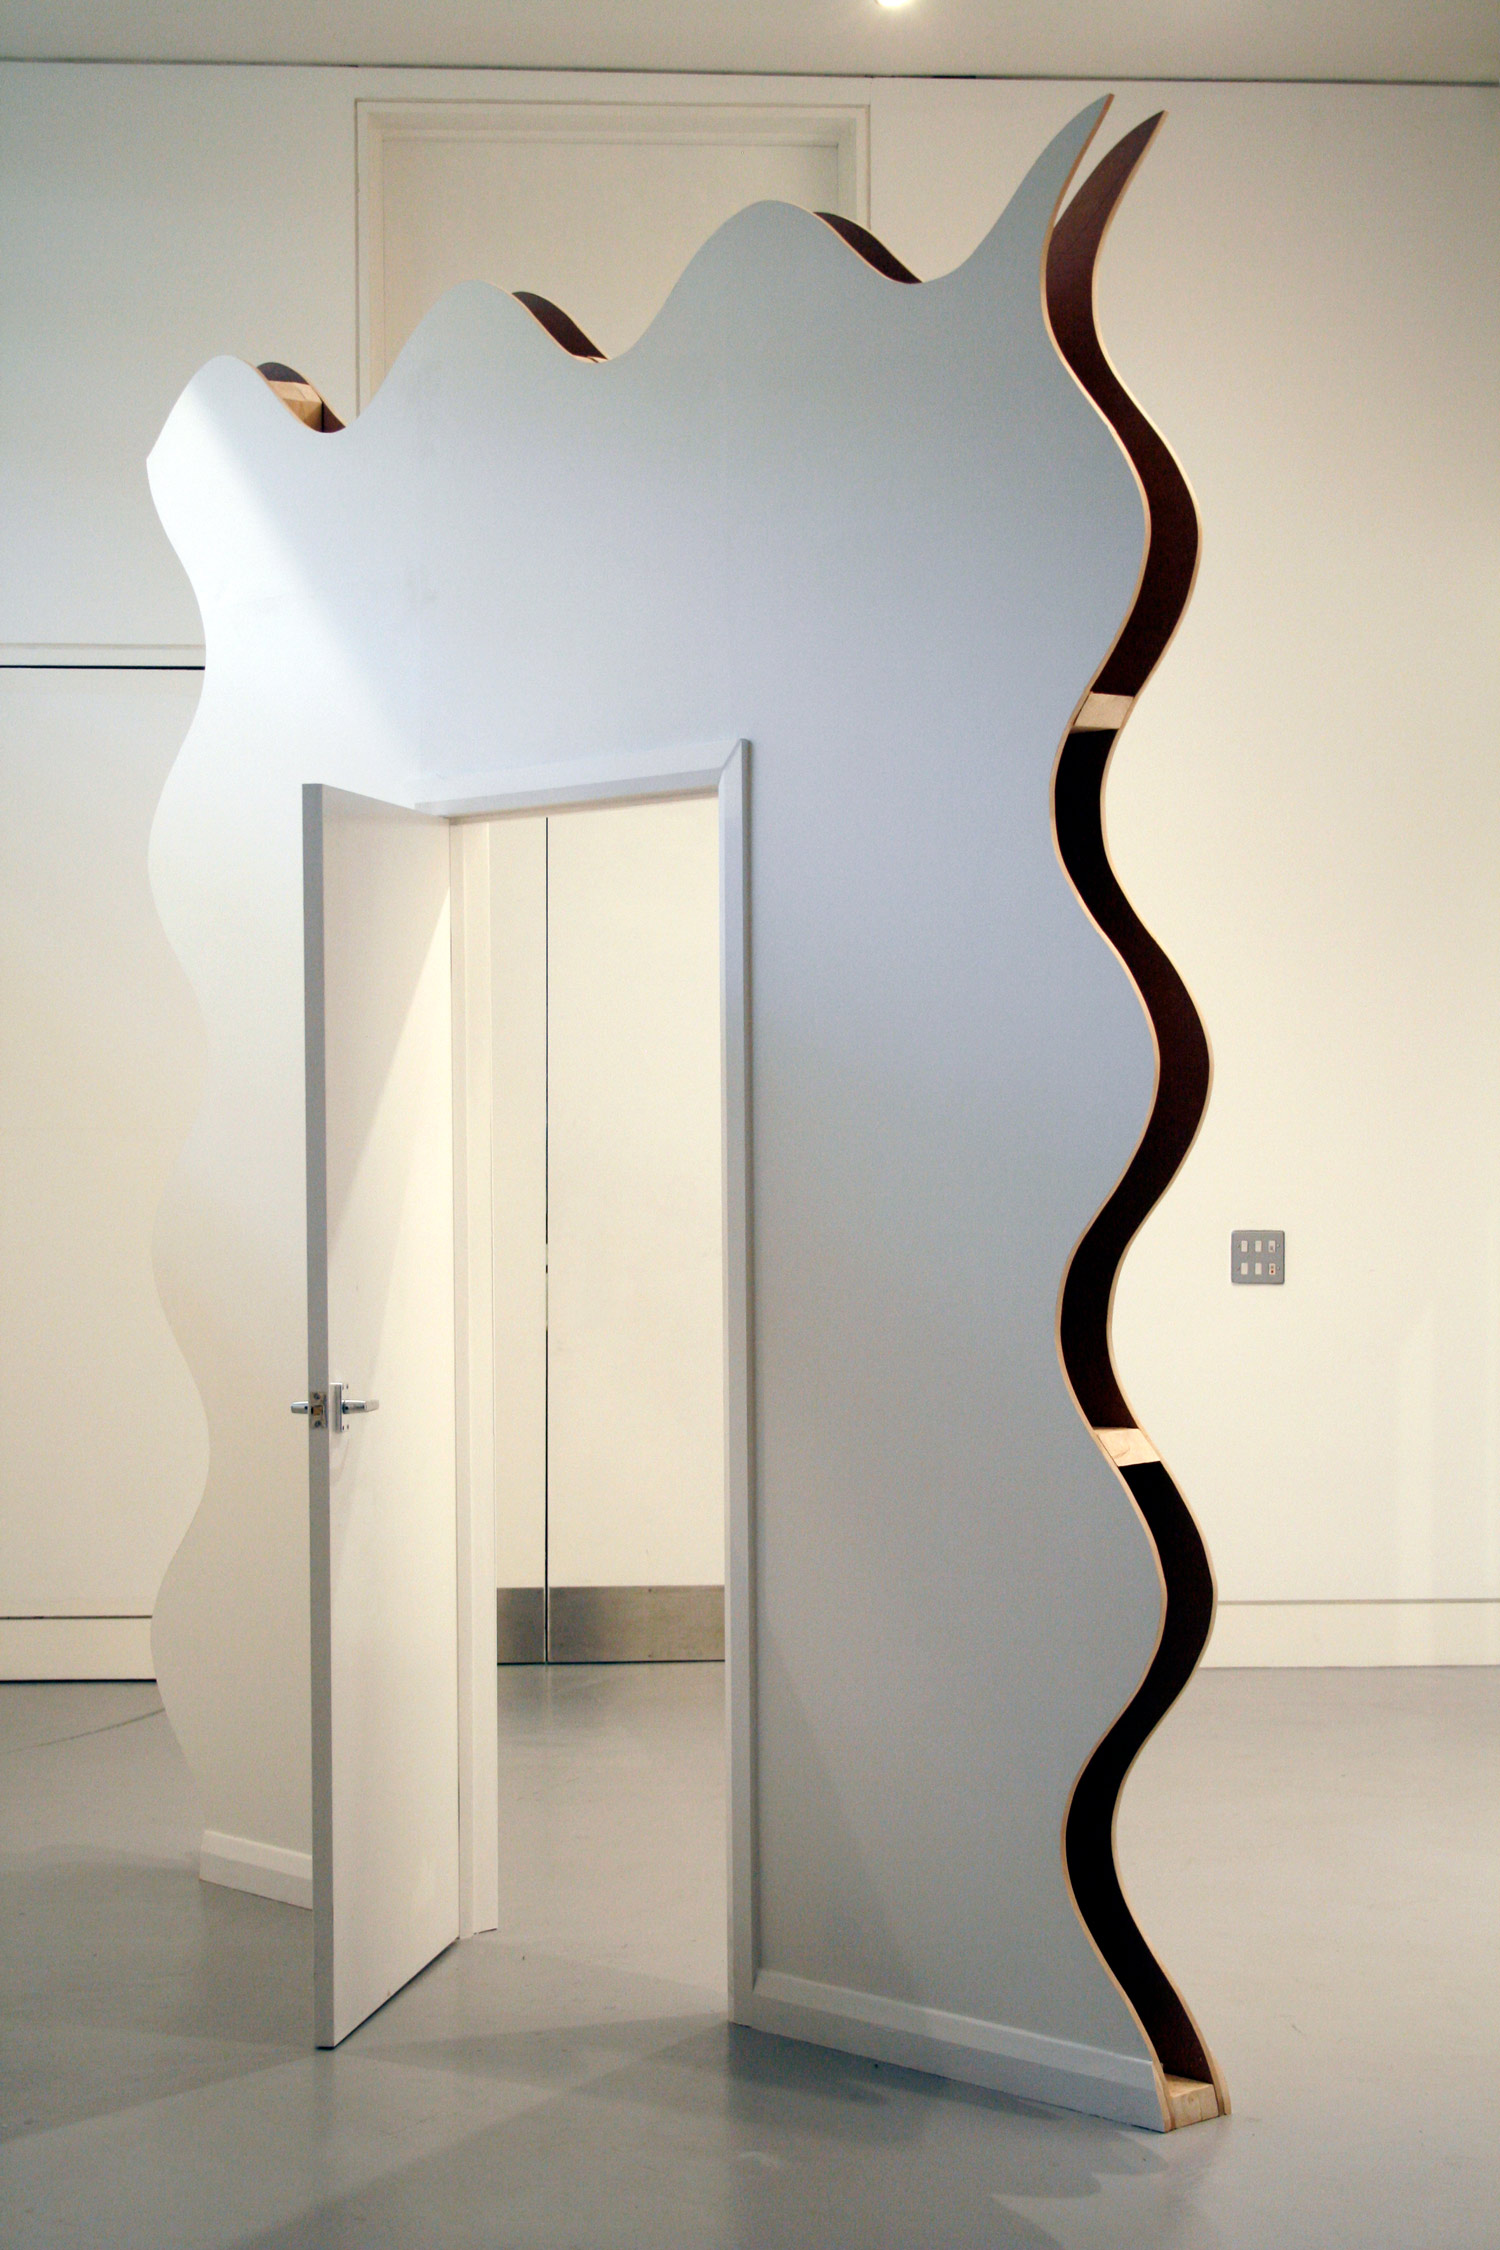 Untitled-Door-In-A-Wall- Sam Porritt